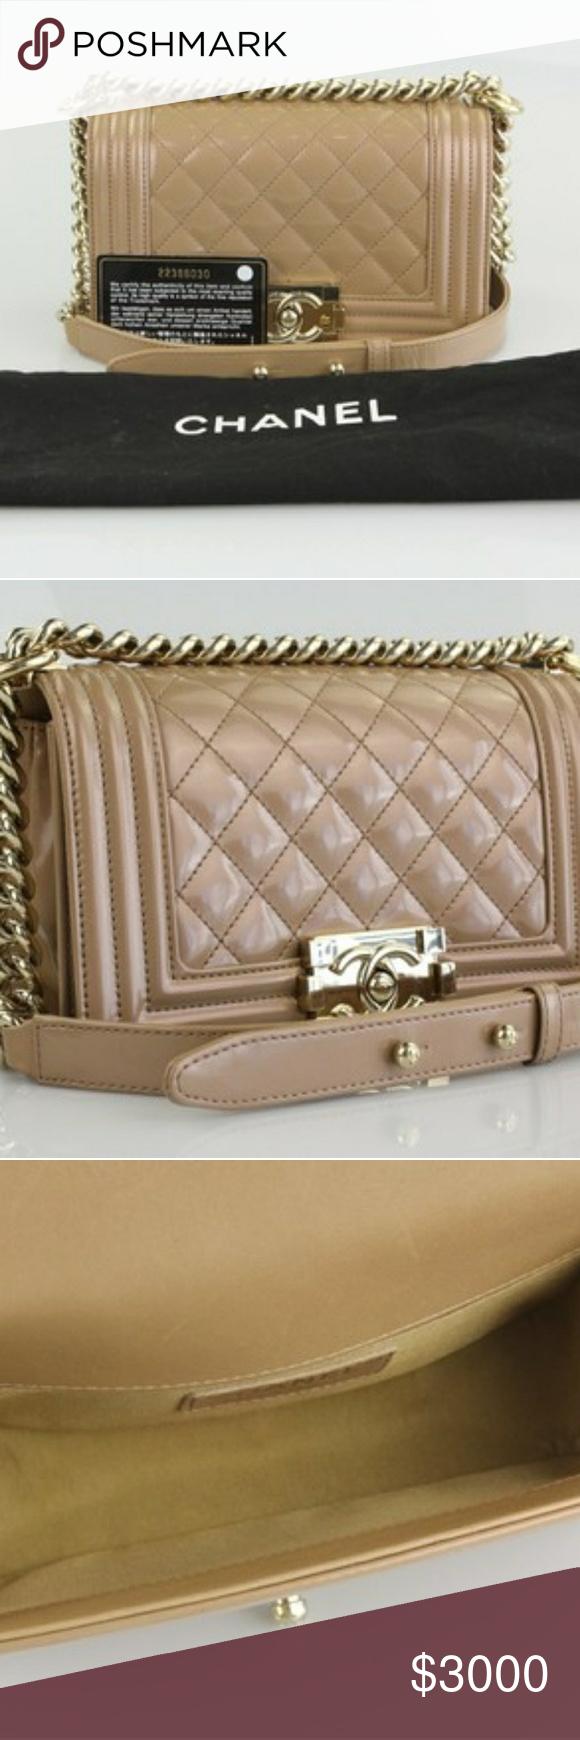 261e28f76eb1 Le boy Chanel Small Boy Shoulder Bag Nude Patent leather 21